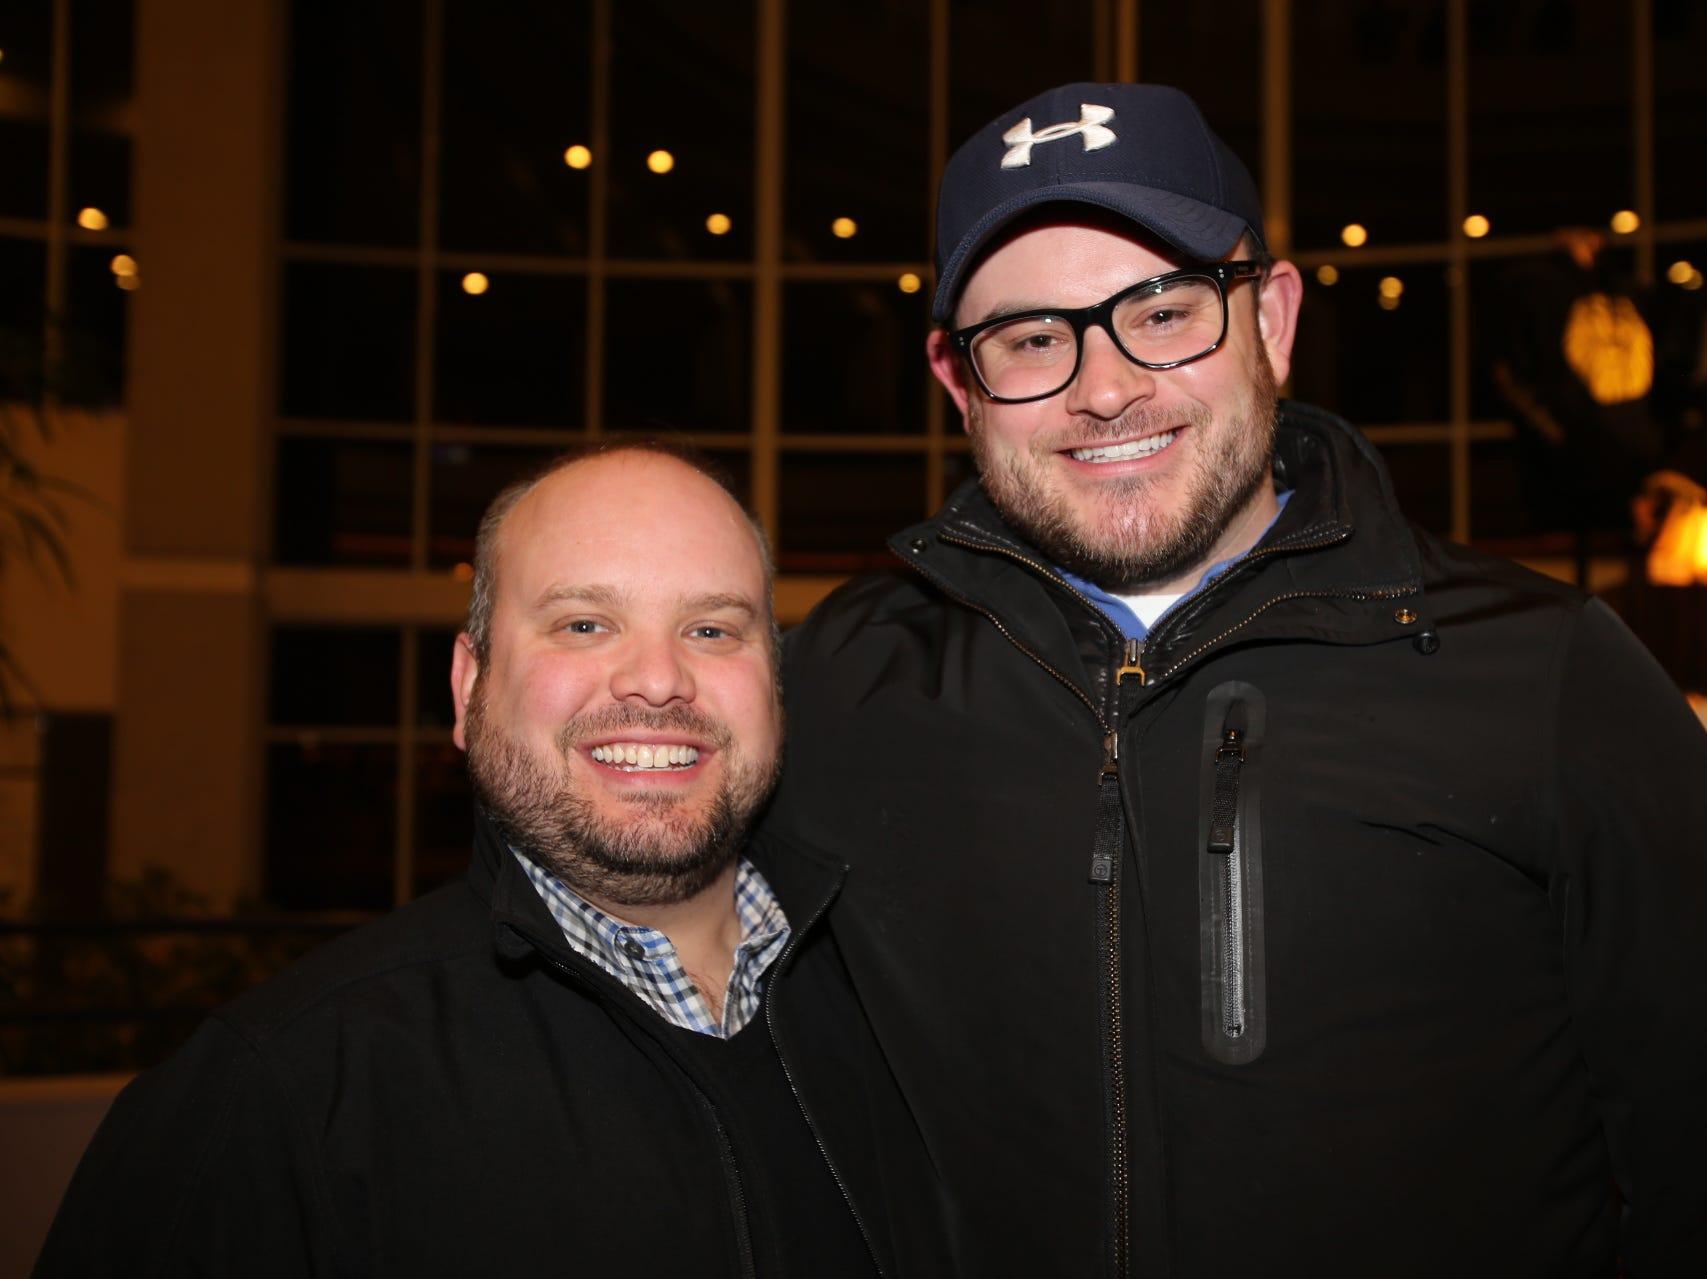 Ryan Cady and Austin Boudreaux